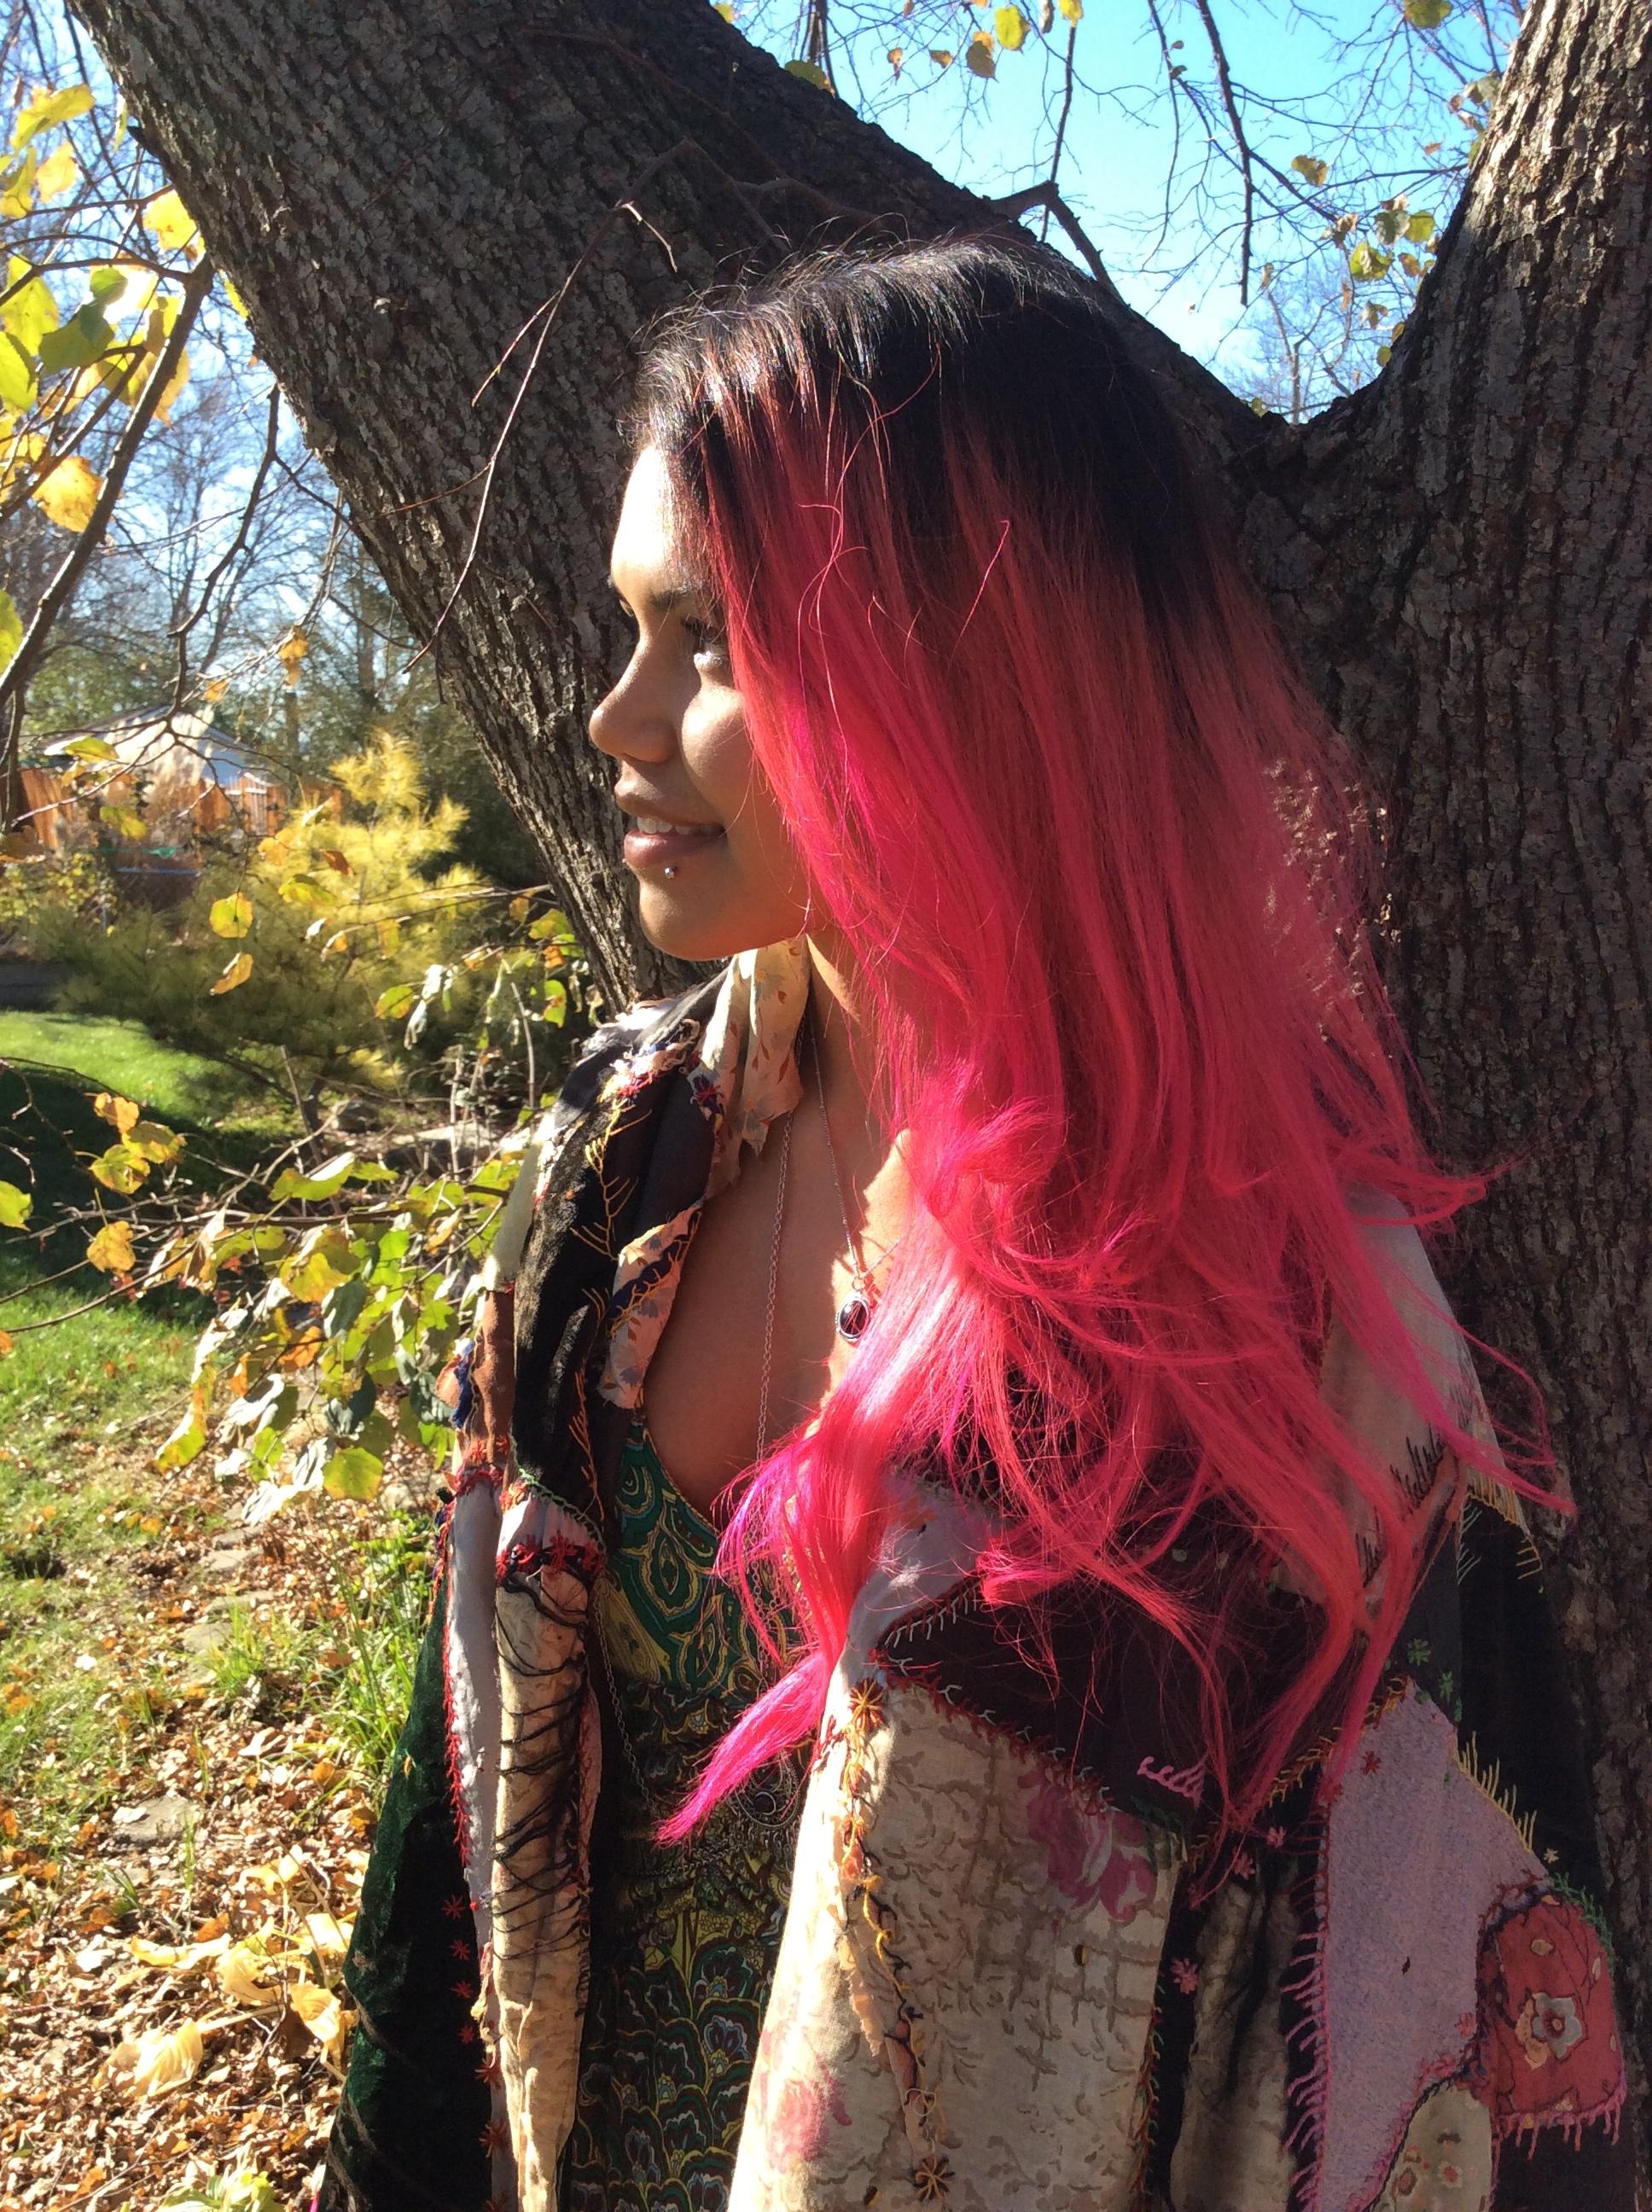 Arielle in the sun.